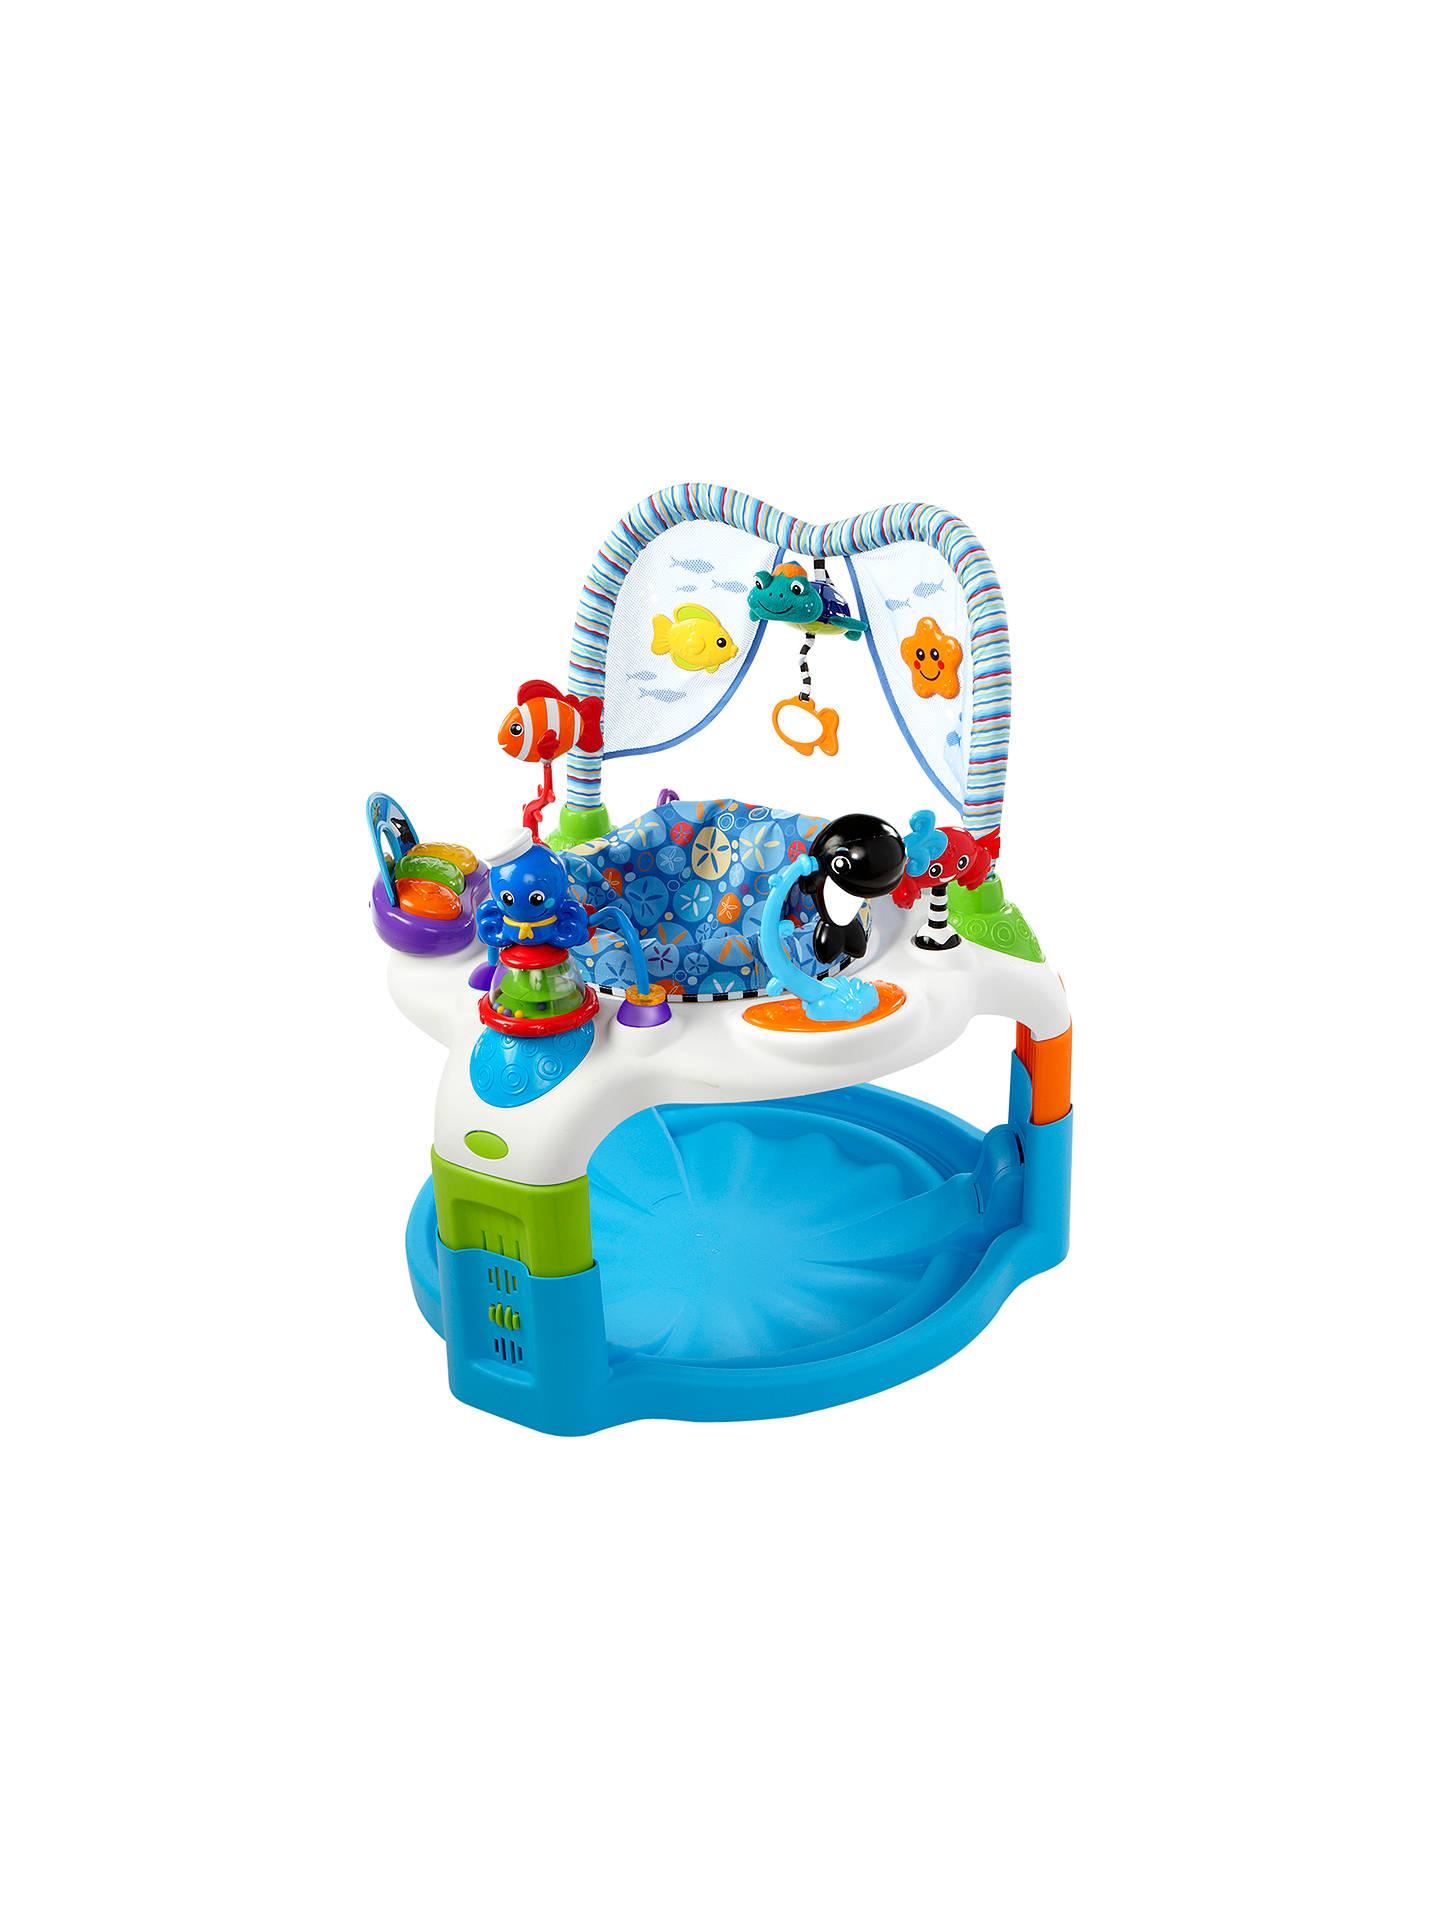 4c216e0a0 Baby Einstein Neptune Activity Saucer at John Lewis   Partners